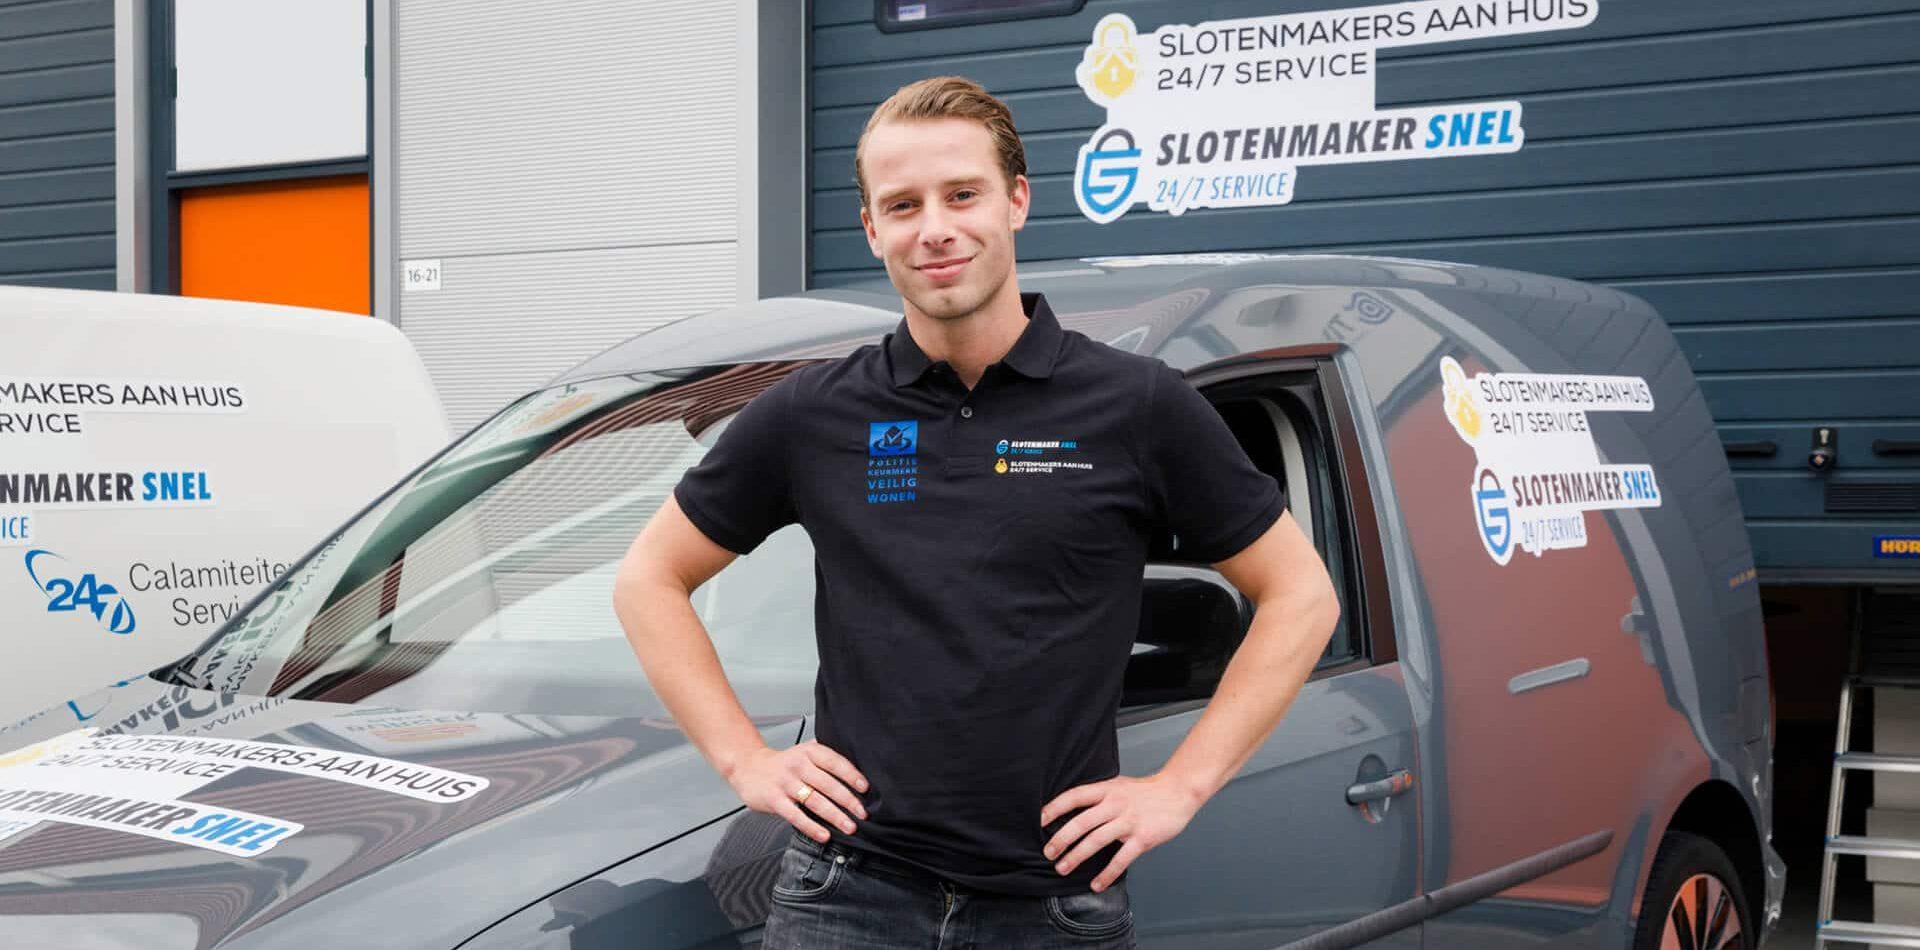 Slotenmaker Heemskerk